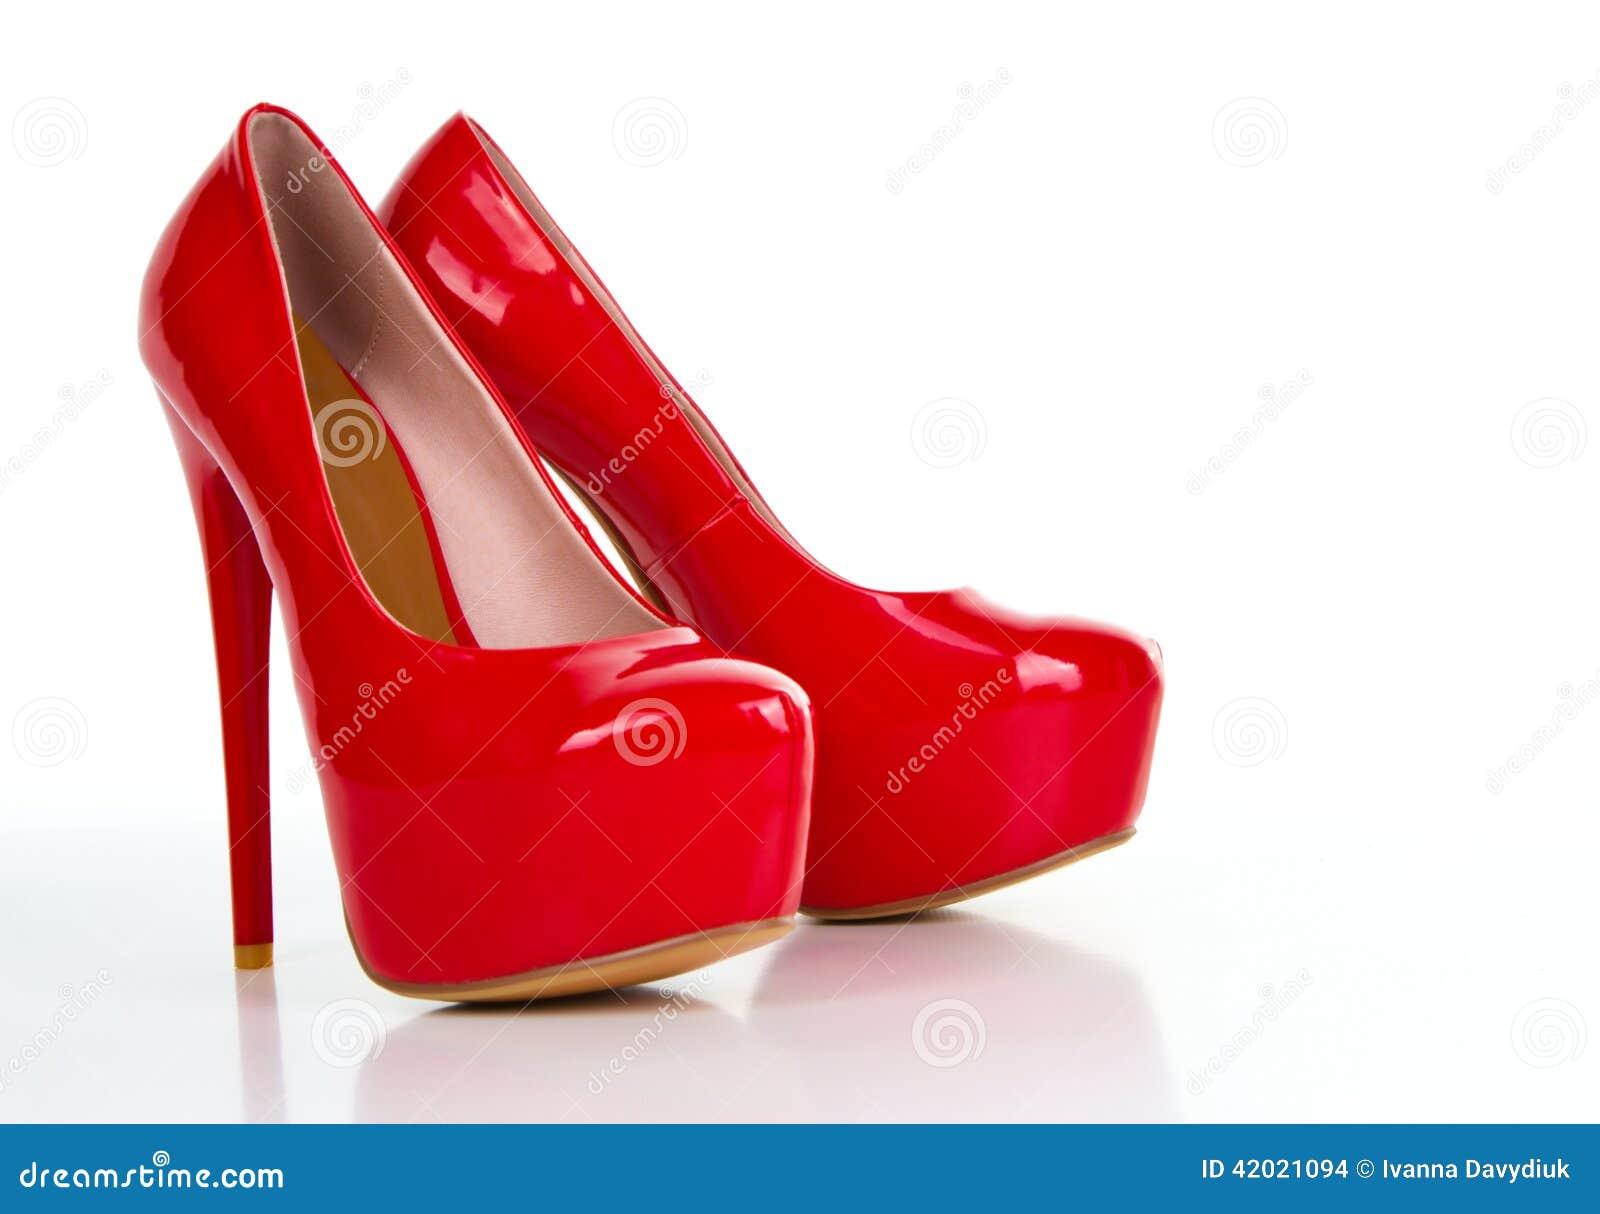 chaussure talon haut rouge gold sandals heels. Black Bedroom Furniture Sets. Home Design Ideas